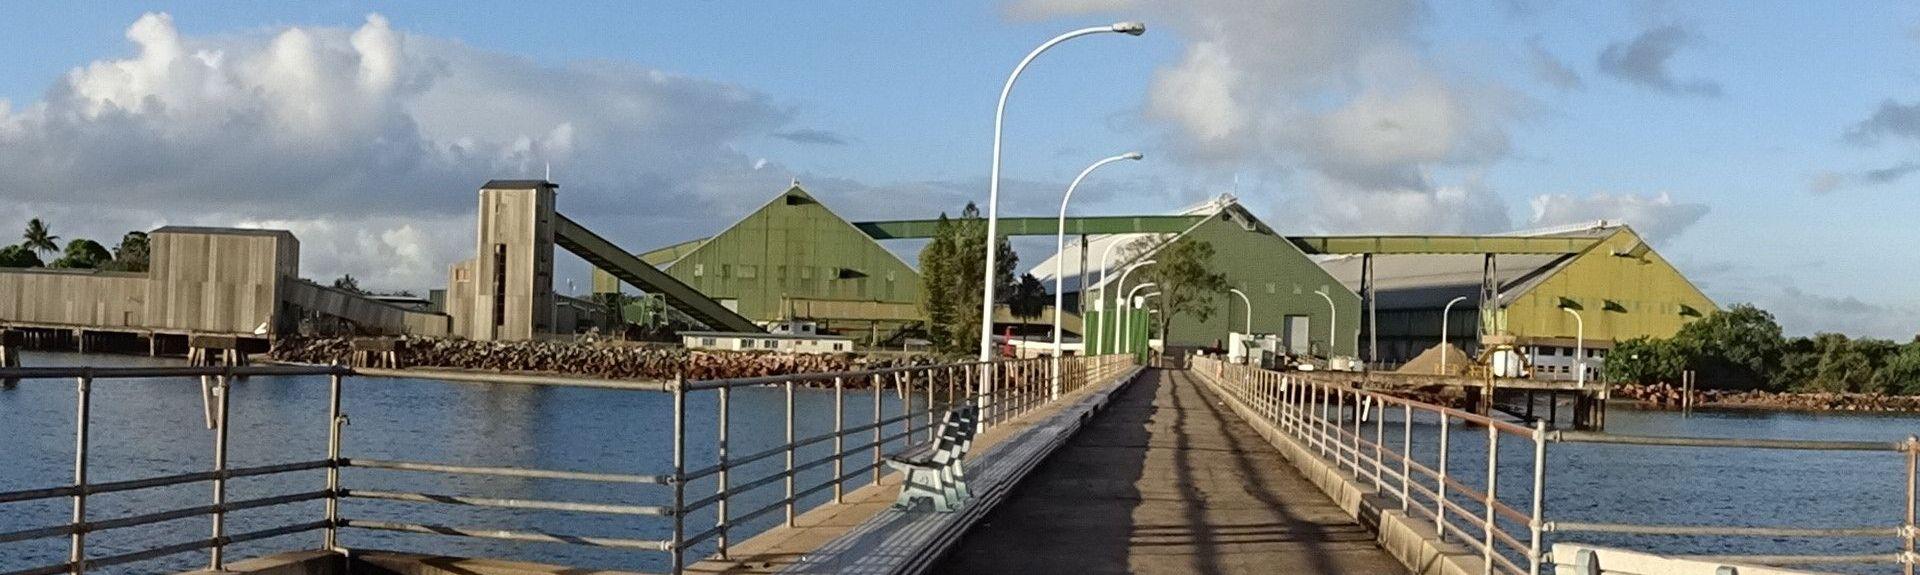 Hinchinbrook Island National Park, Hinchinbrook Island, Hinchinbrook Island QLD, Australia